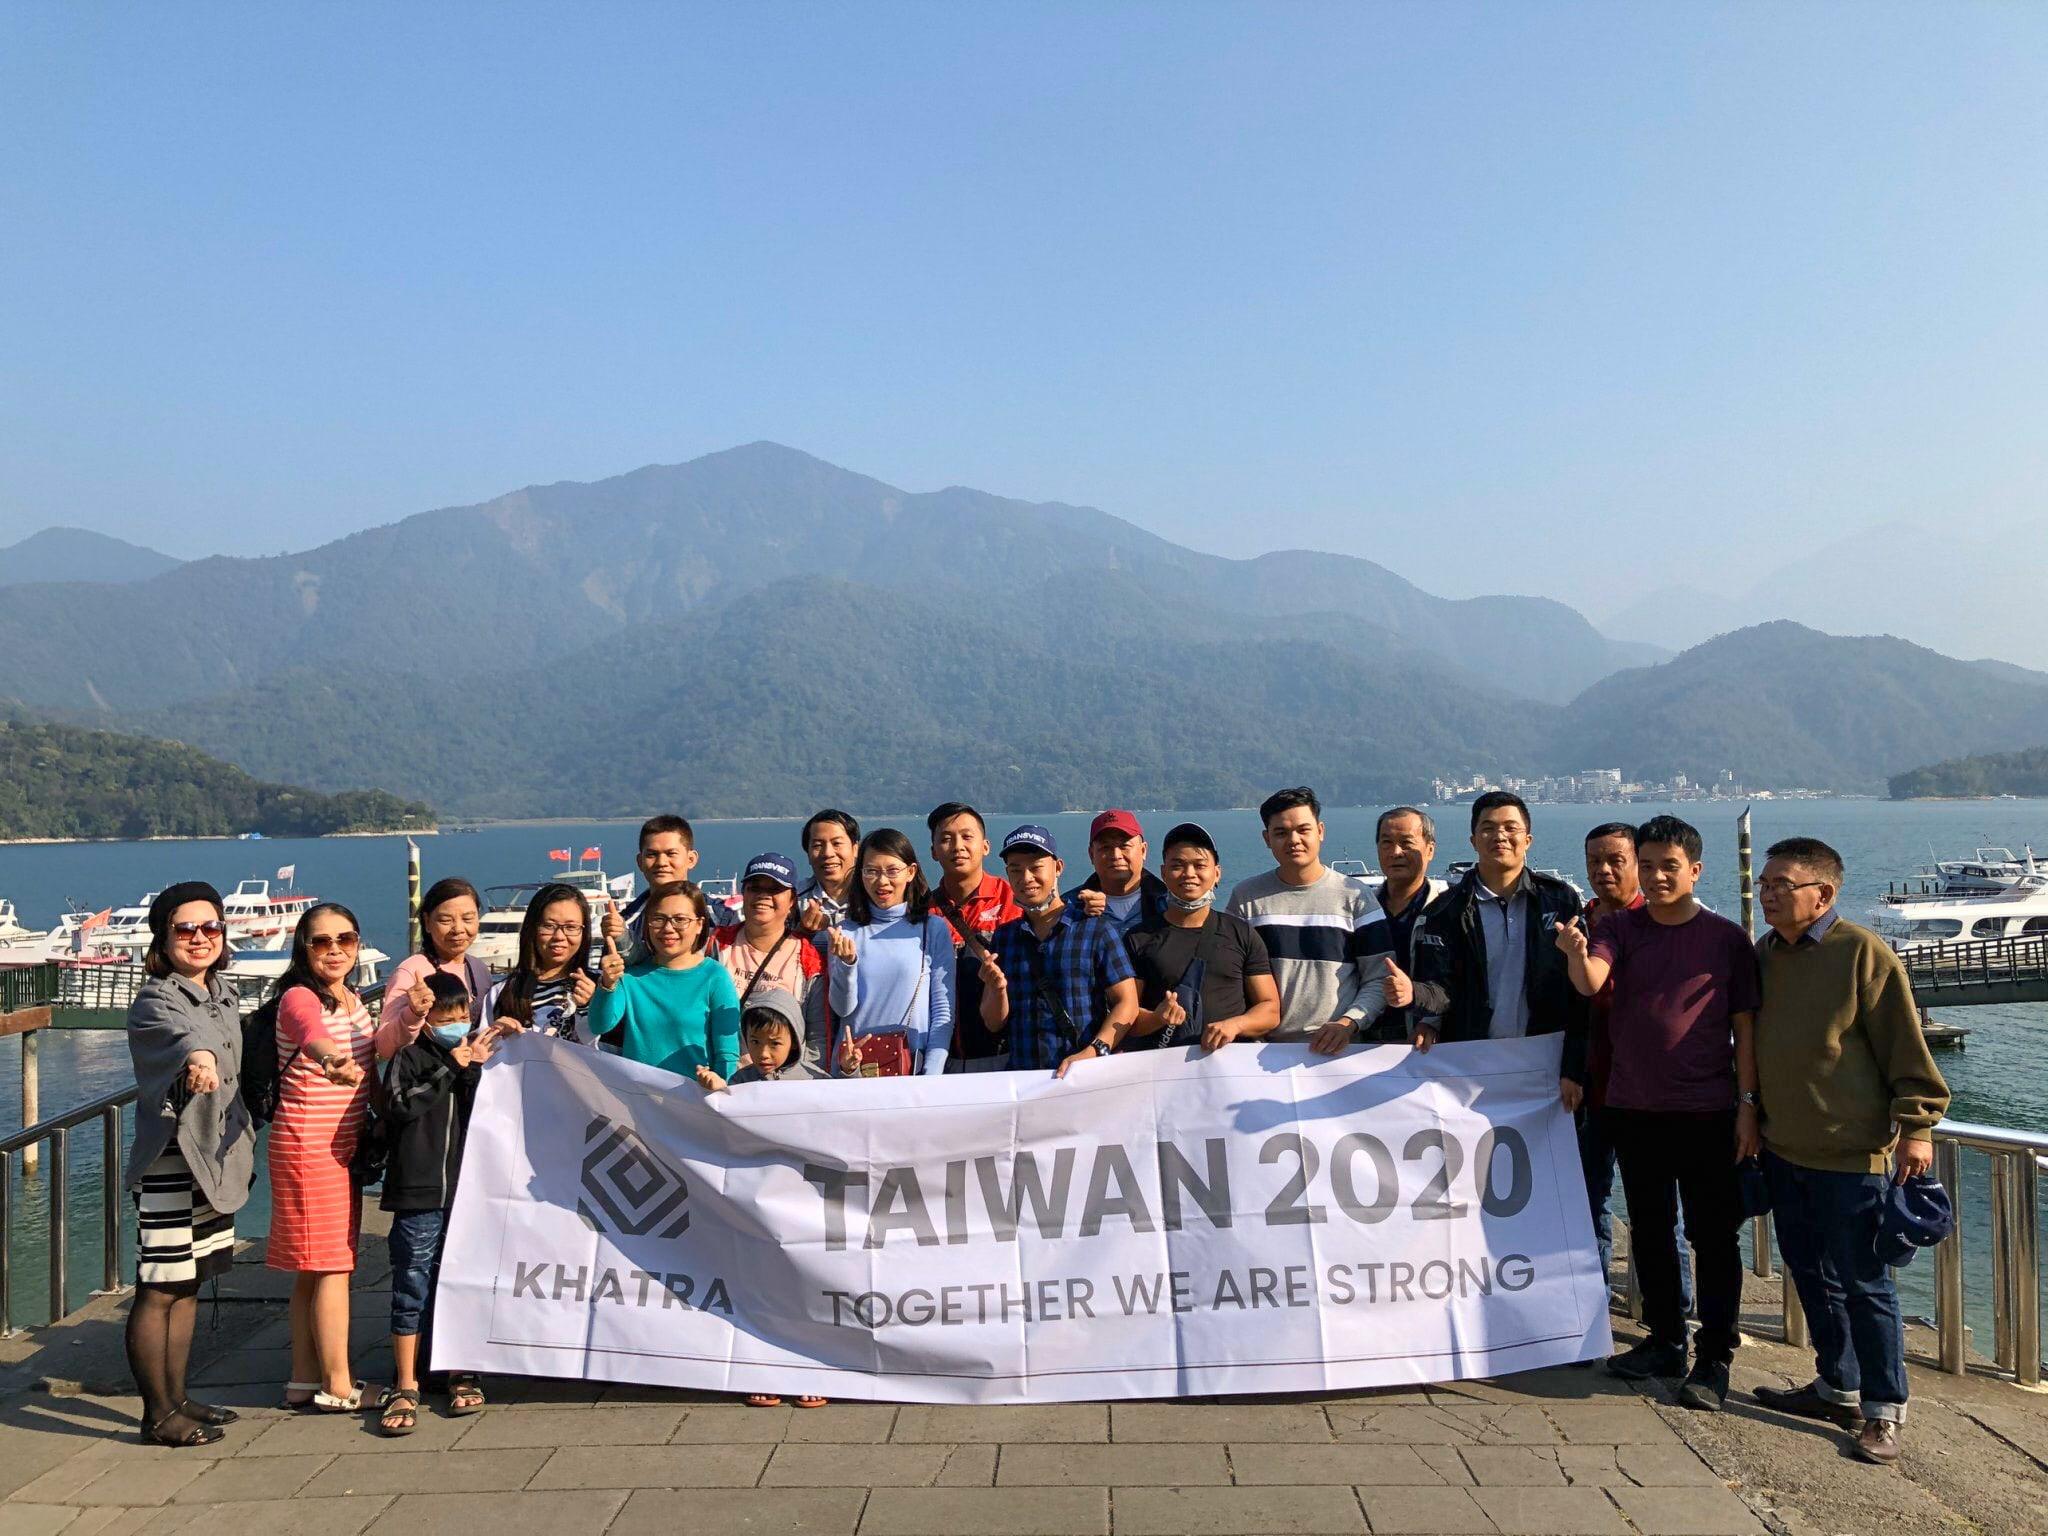 Taiwan teambuilding 2020